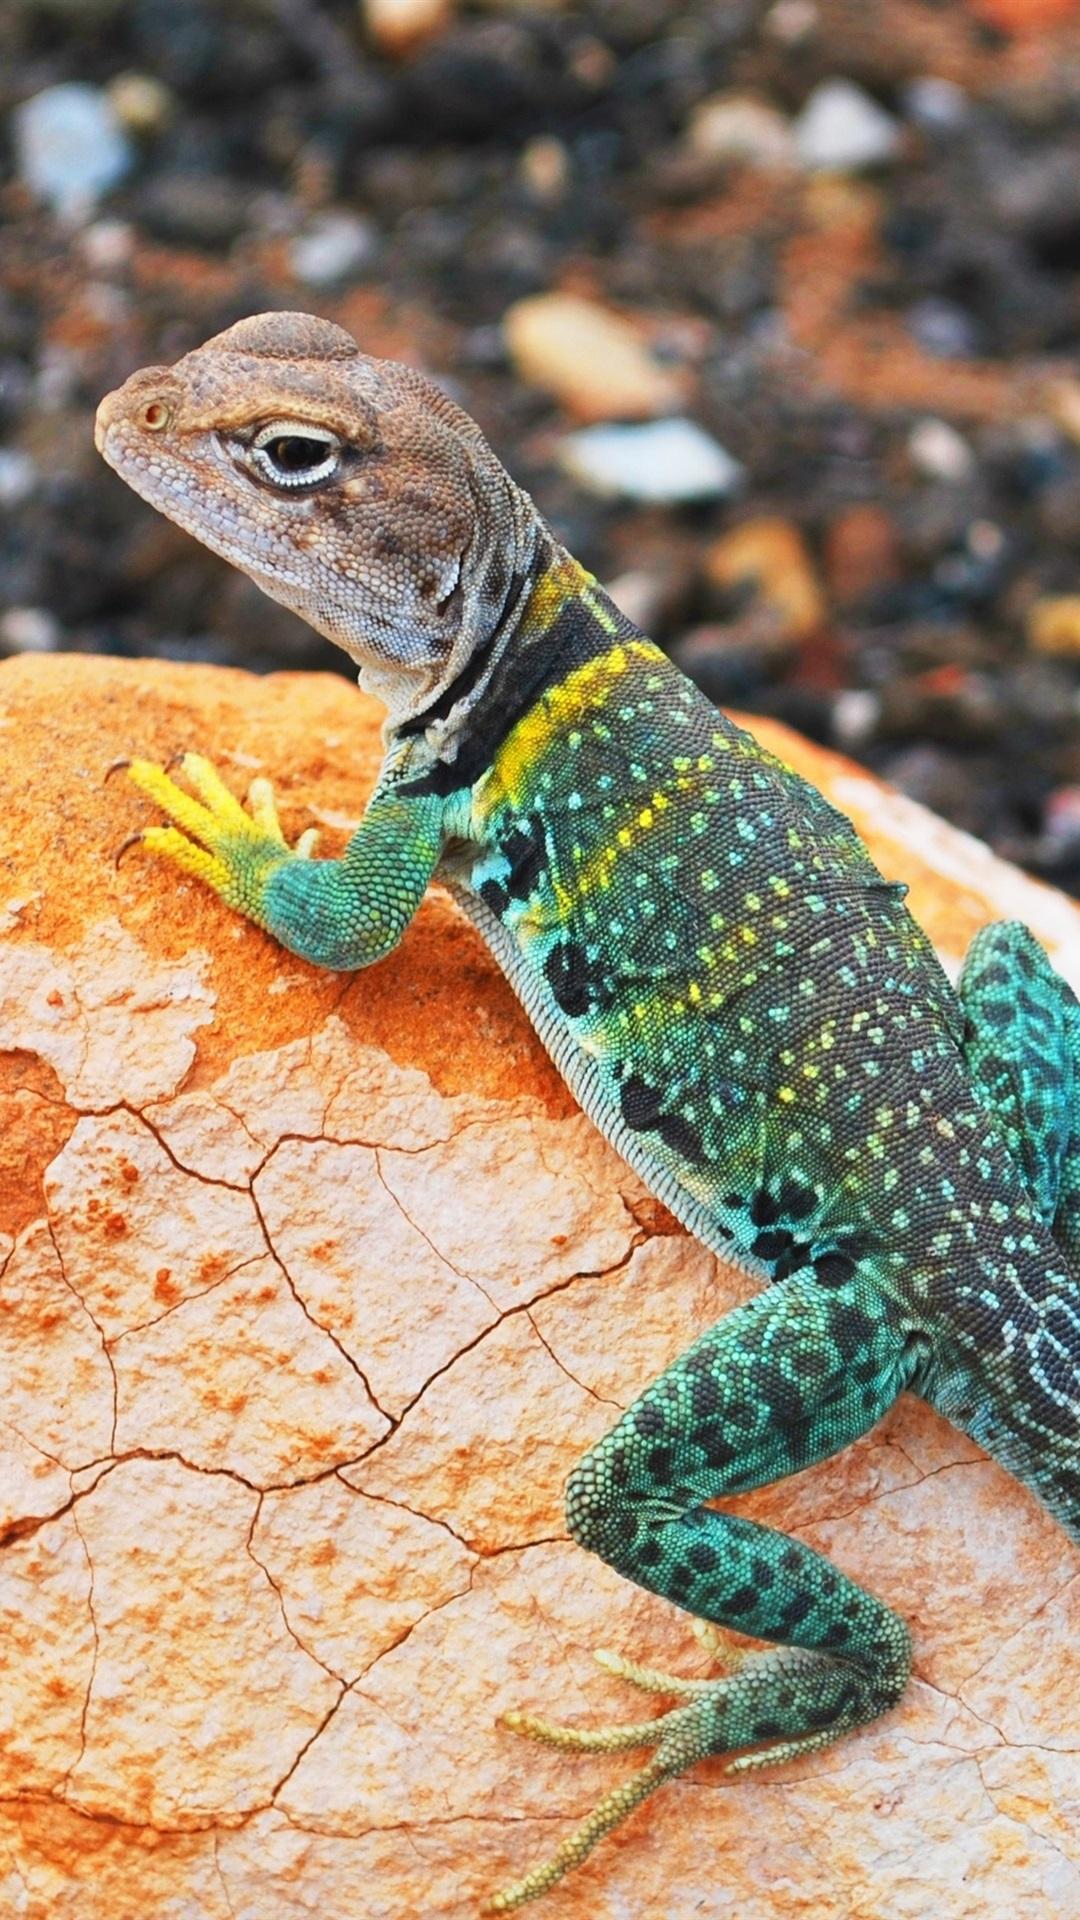 Colorful Lizard Gecko Stone Bokeh 1080x1920 Iphone 8 7 6